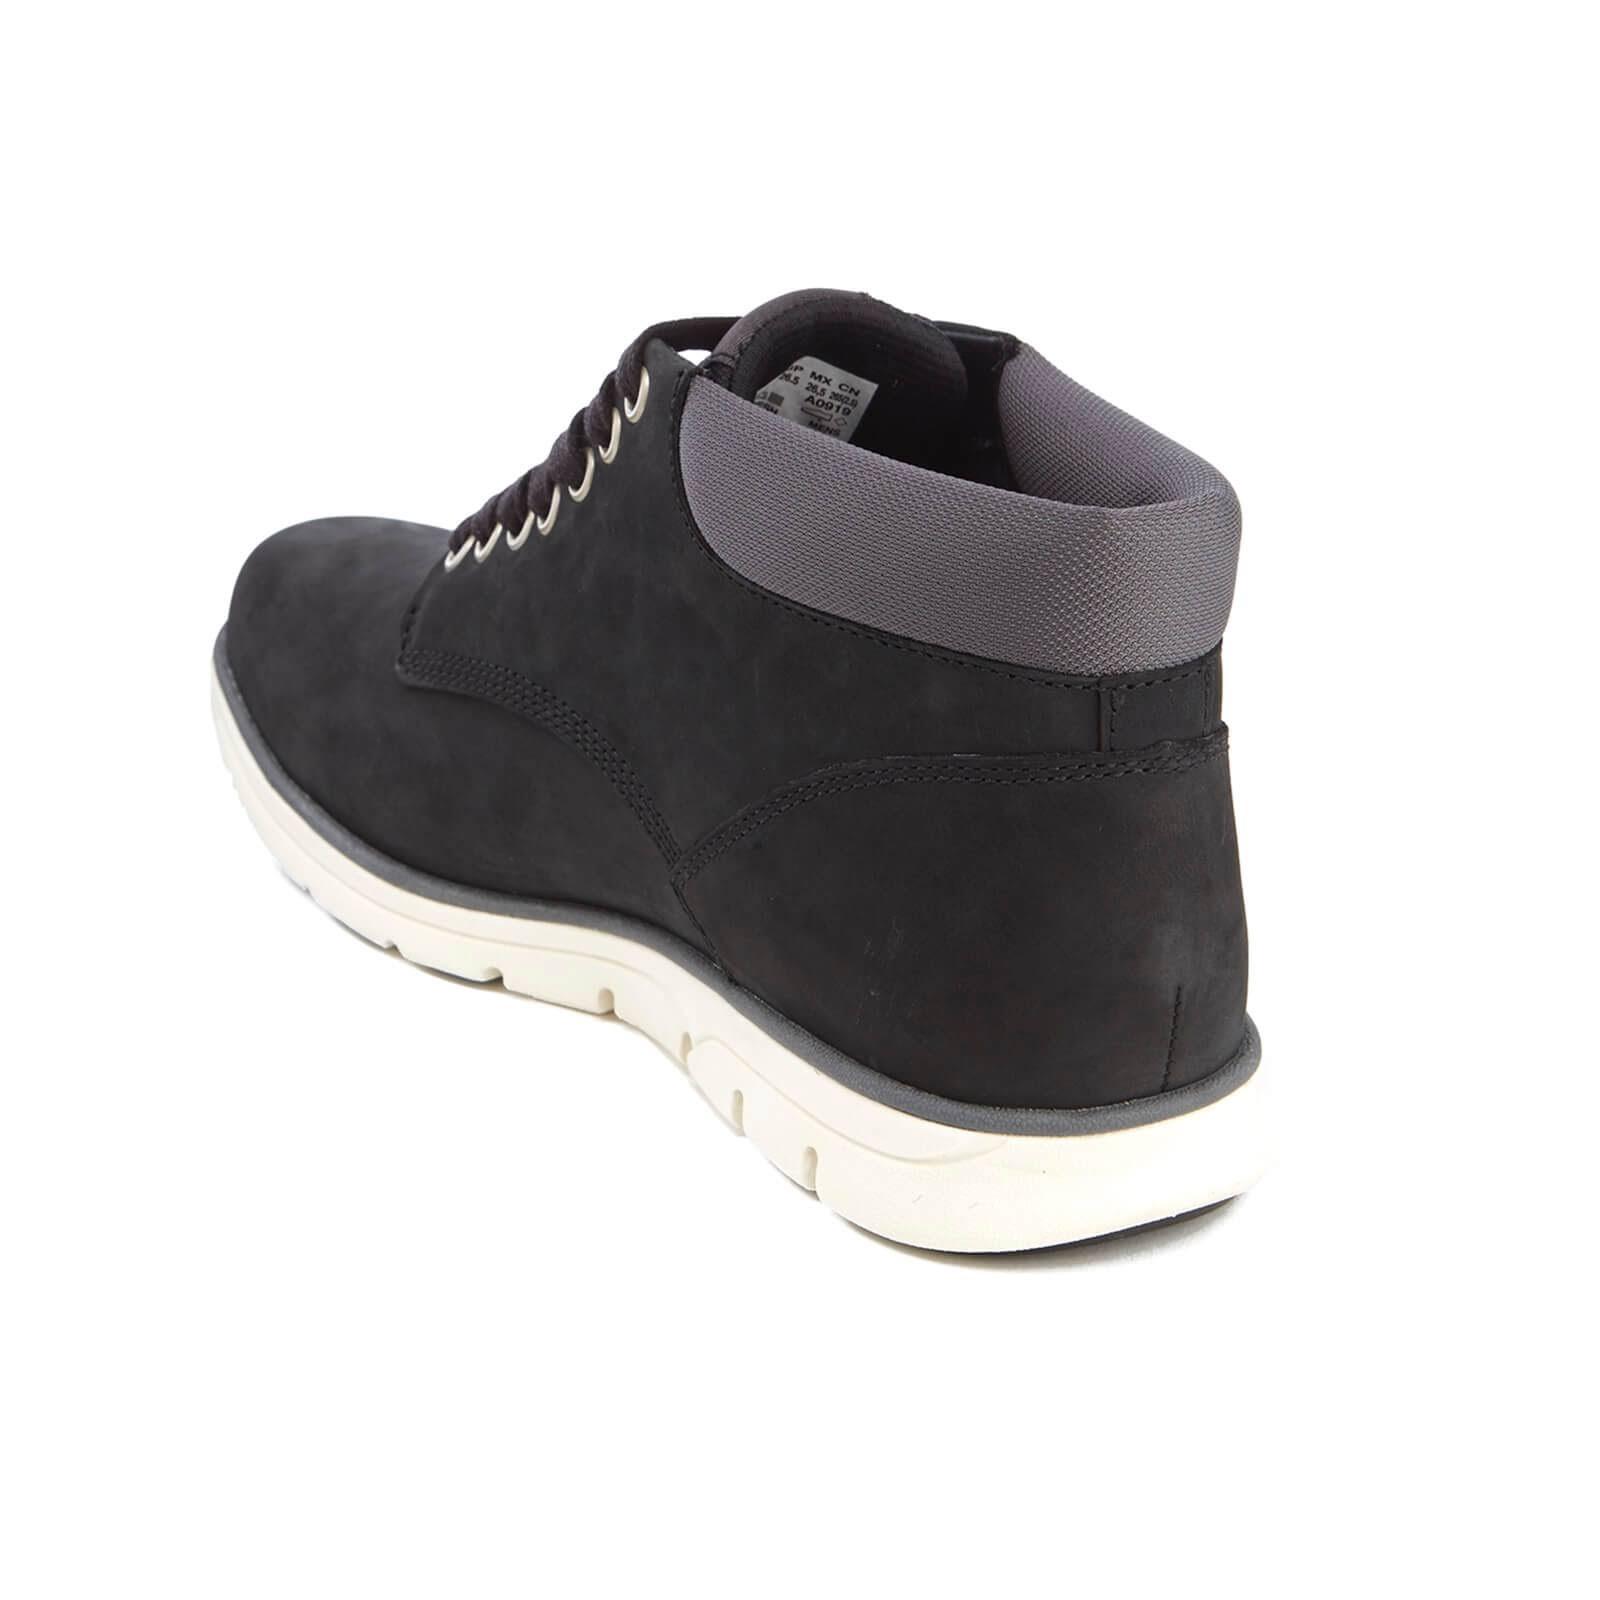 Ellegant Men A146q Black Bradstreet Shoes Timberland Chukka pwExXqggt